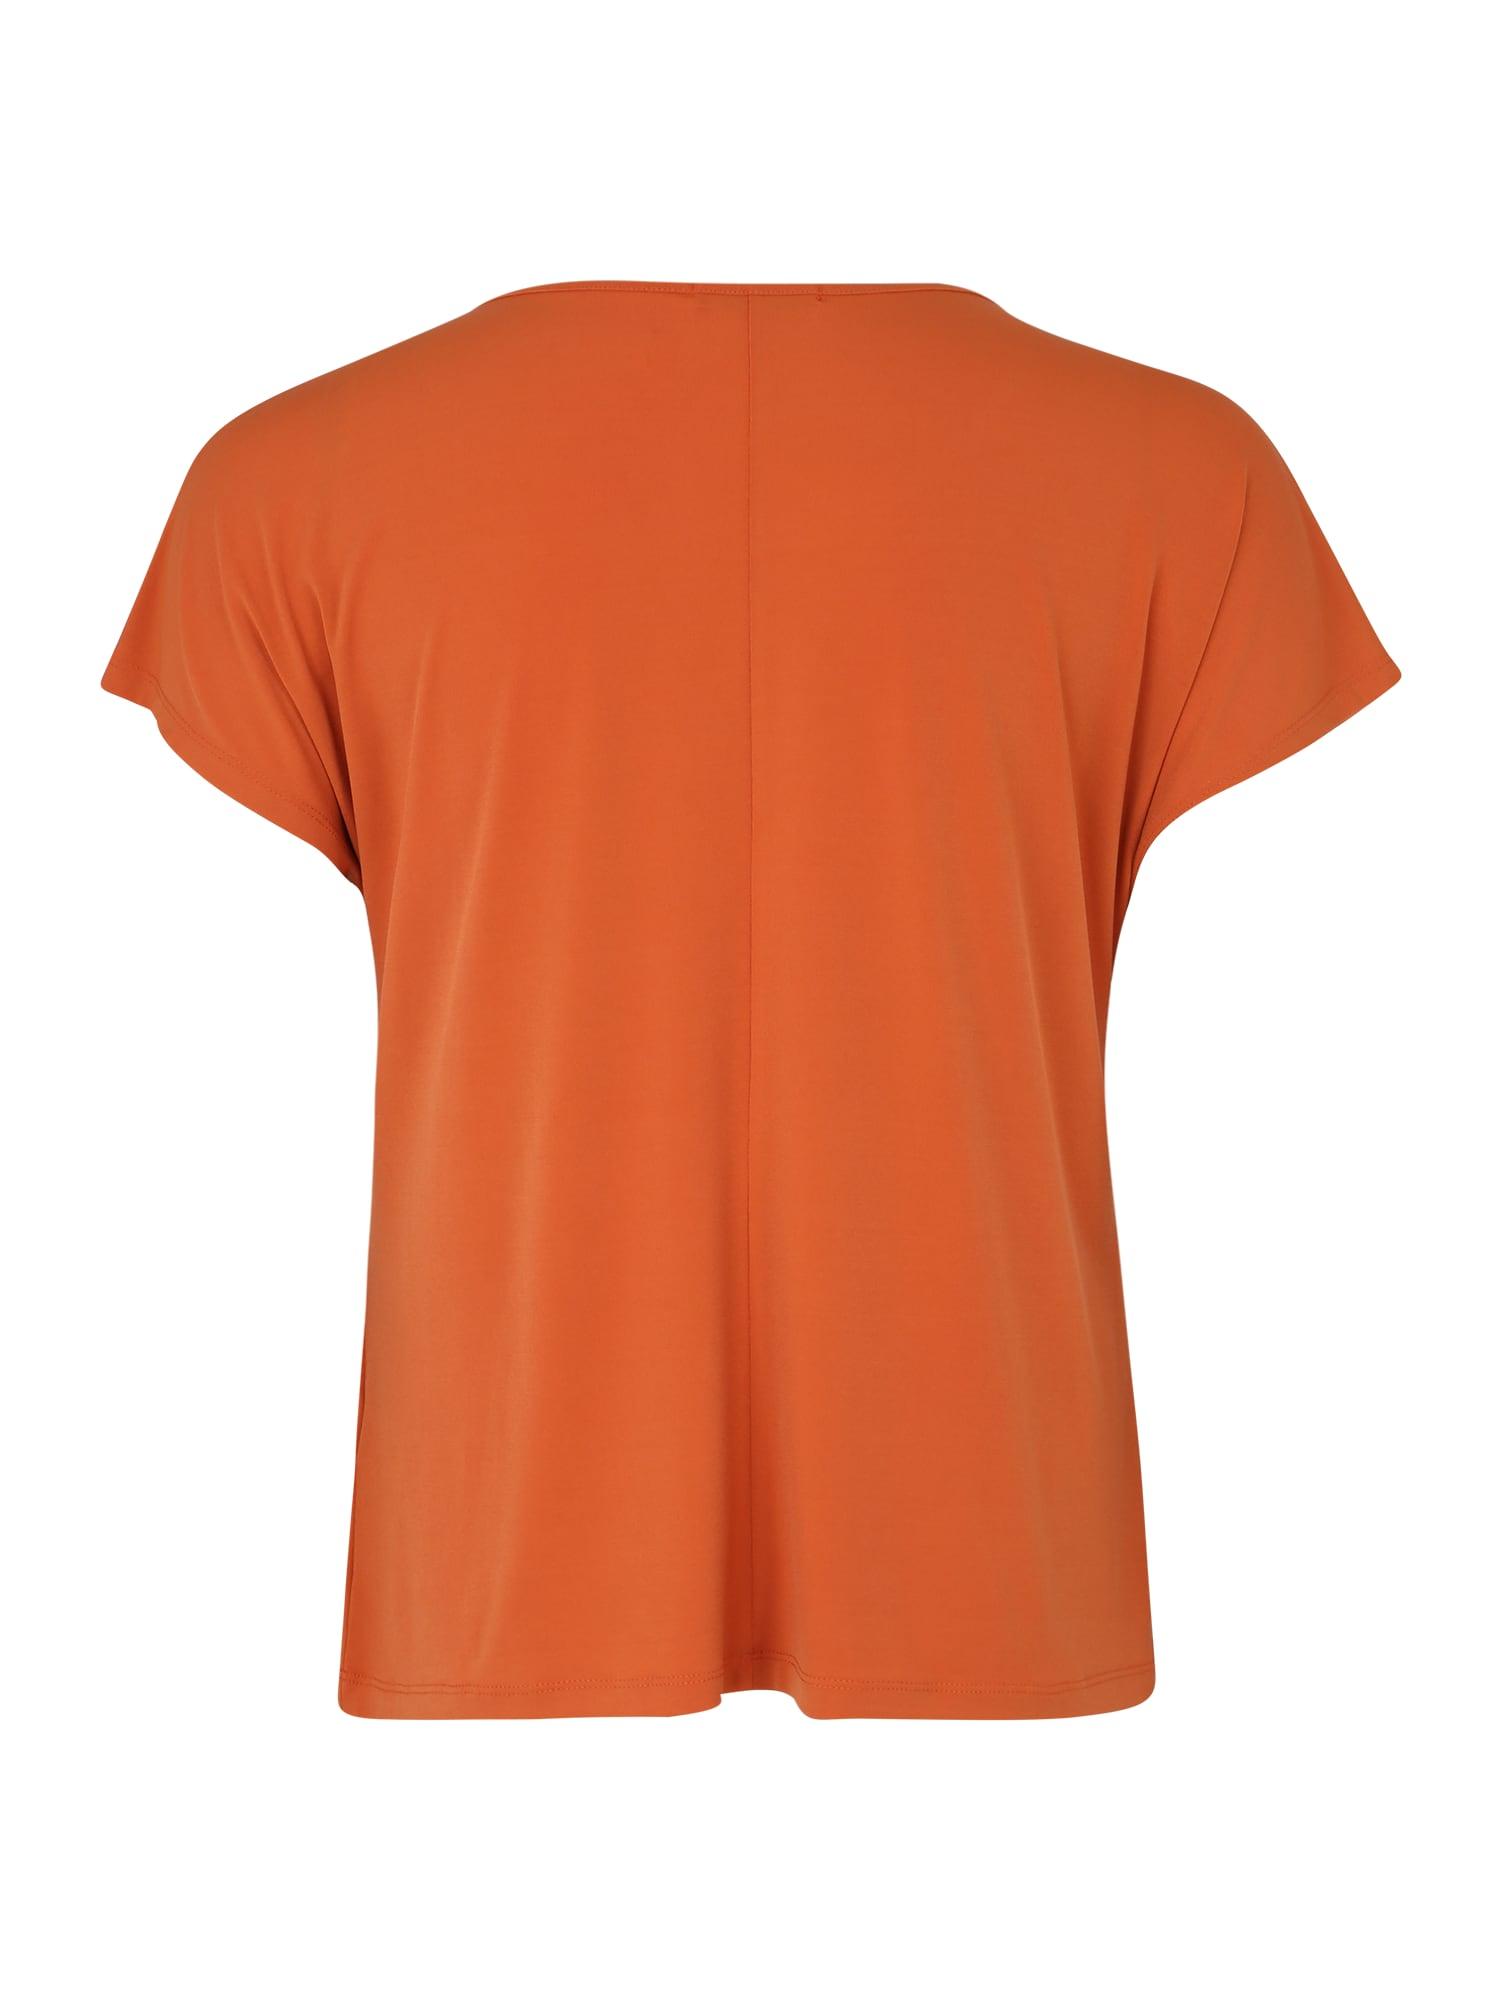 ABOUT YOU Curvy T-shirt 'Mandy'  aprikos